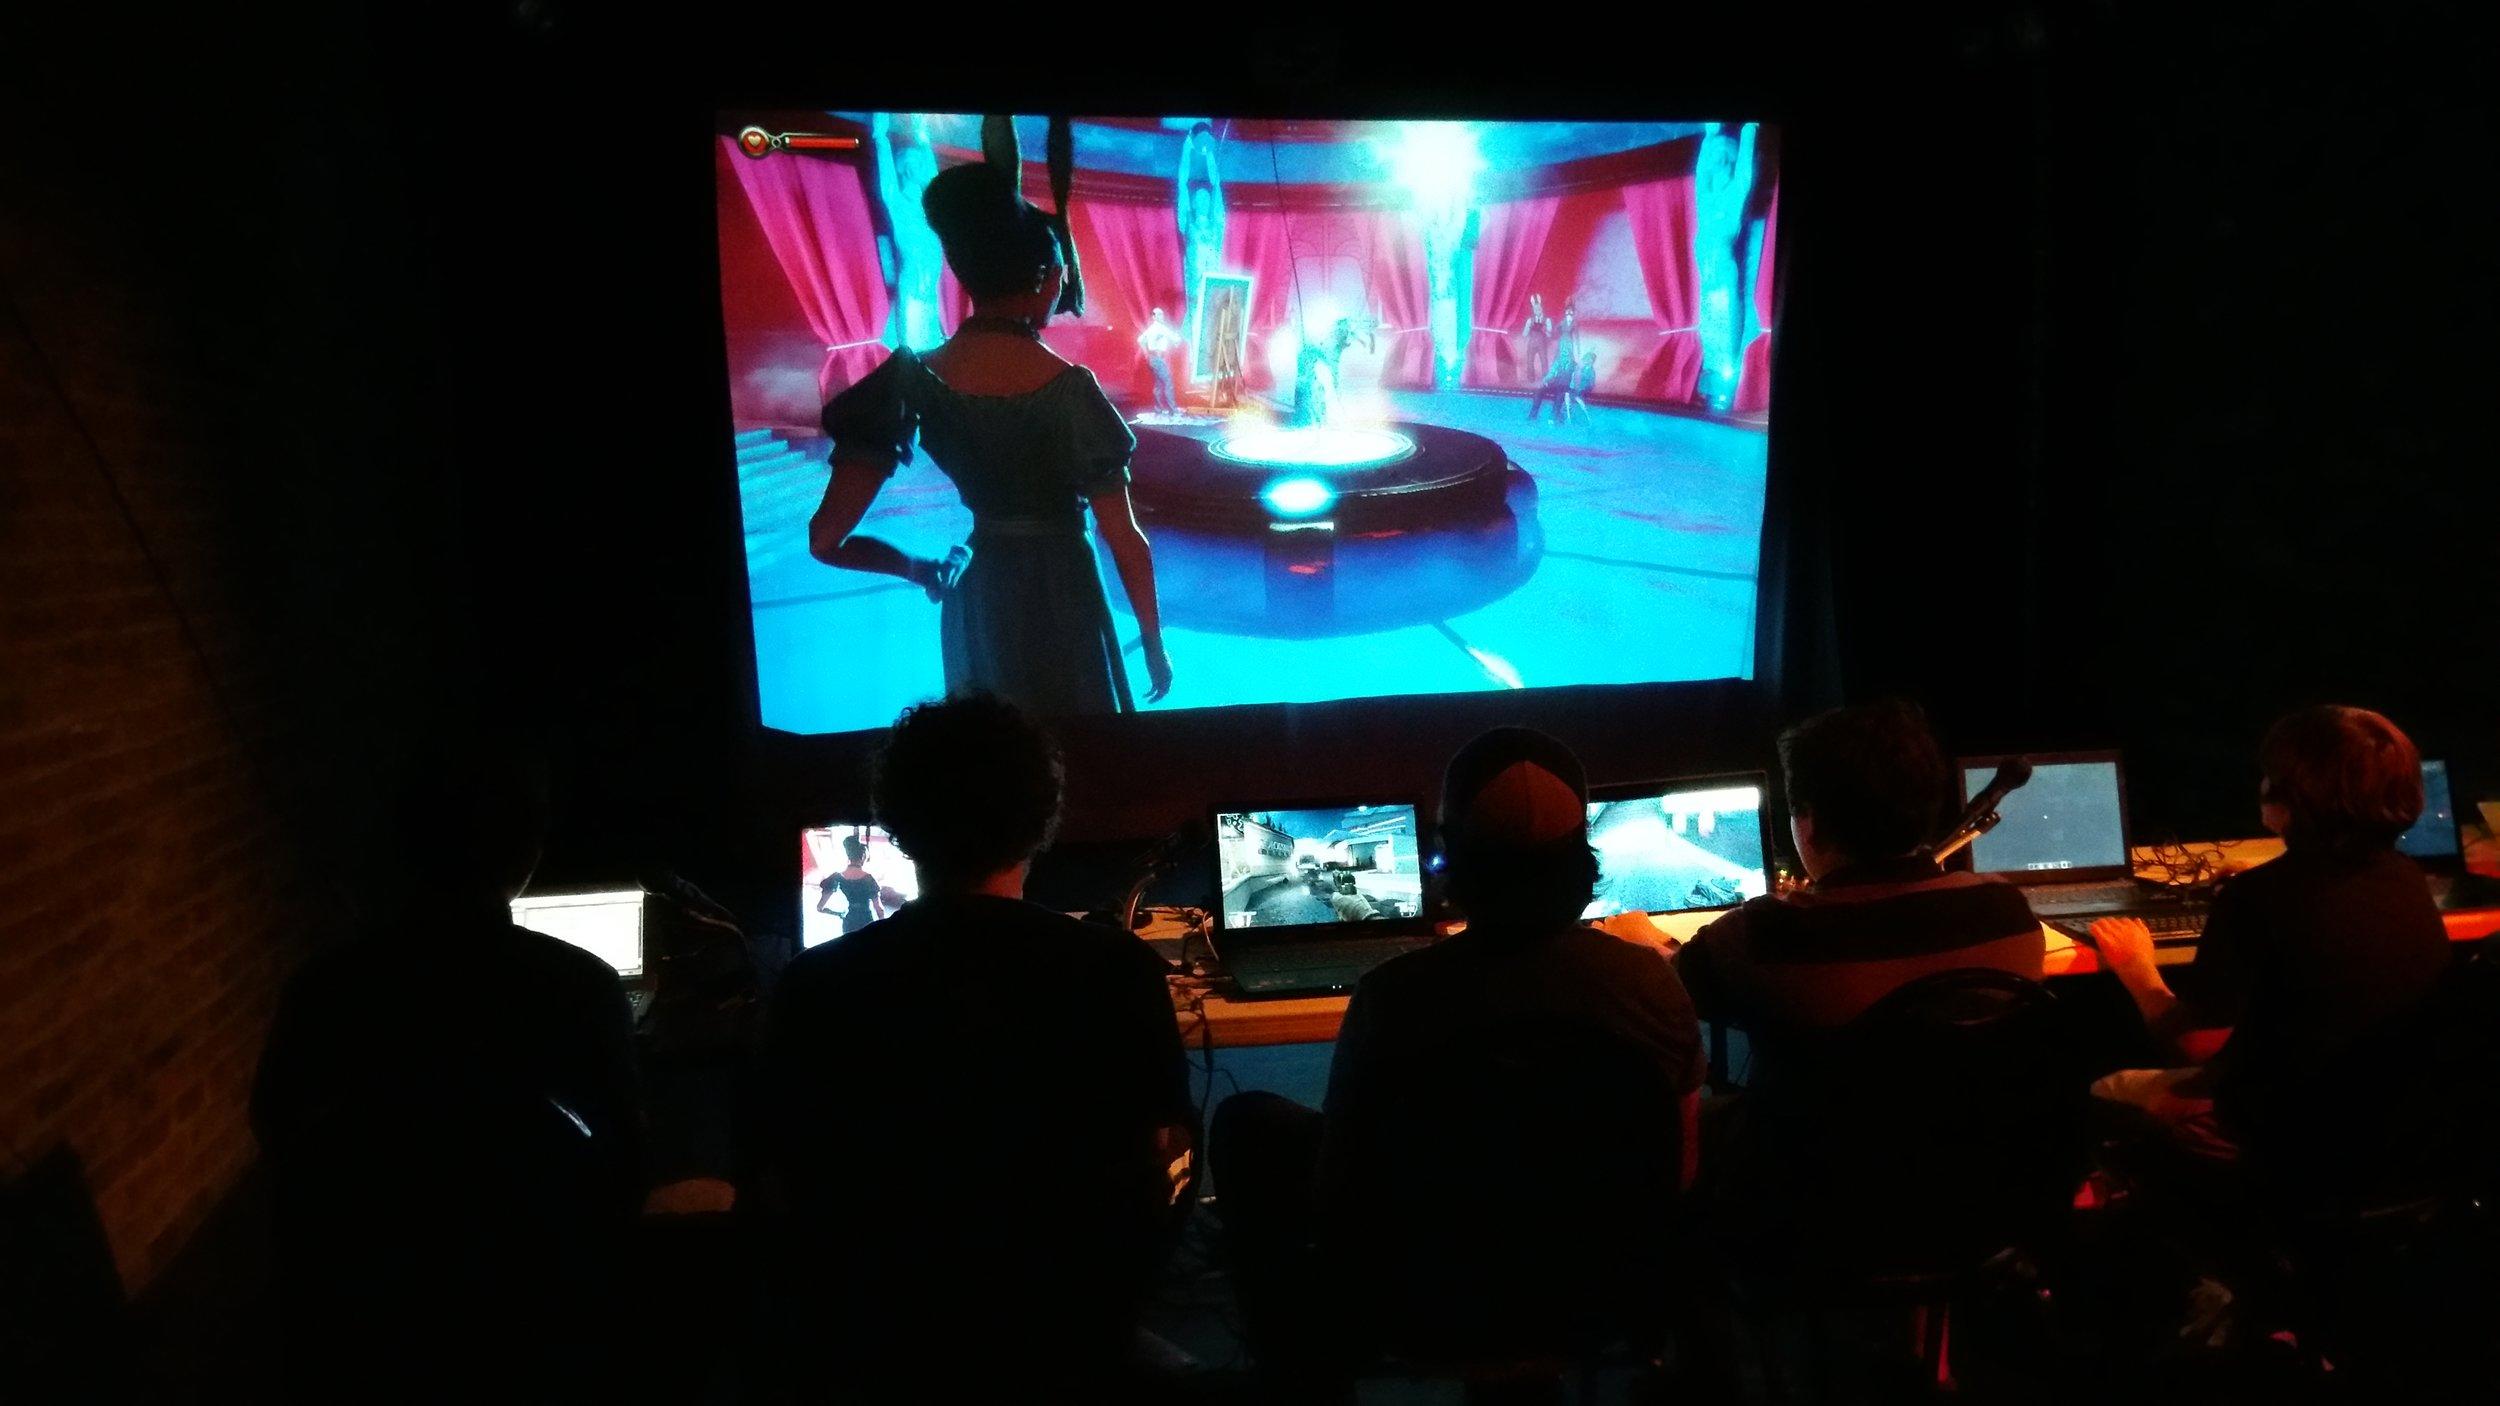 bioshock | poe | masque | video game | theater | machinima